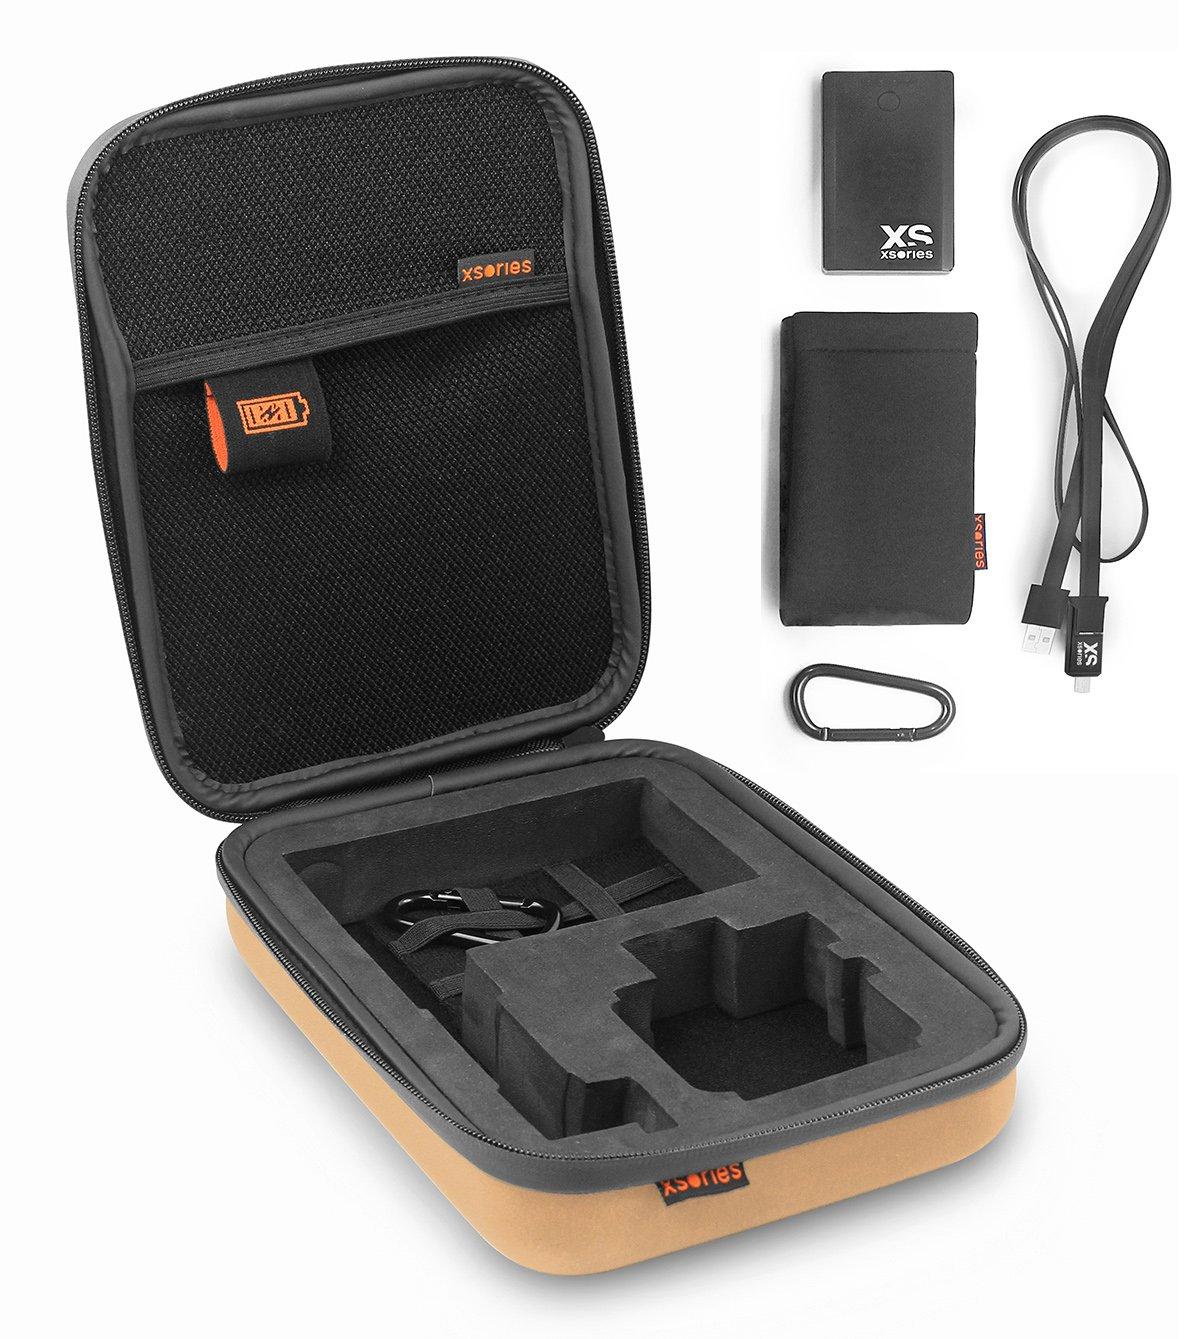 XSories PCPX3A102 Small Power Capxule GoPro Storage Case, 2800mAh Powerbank (Khaki)